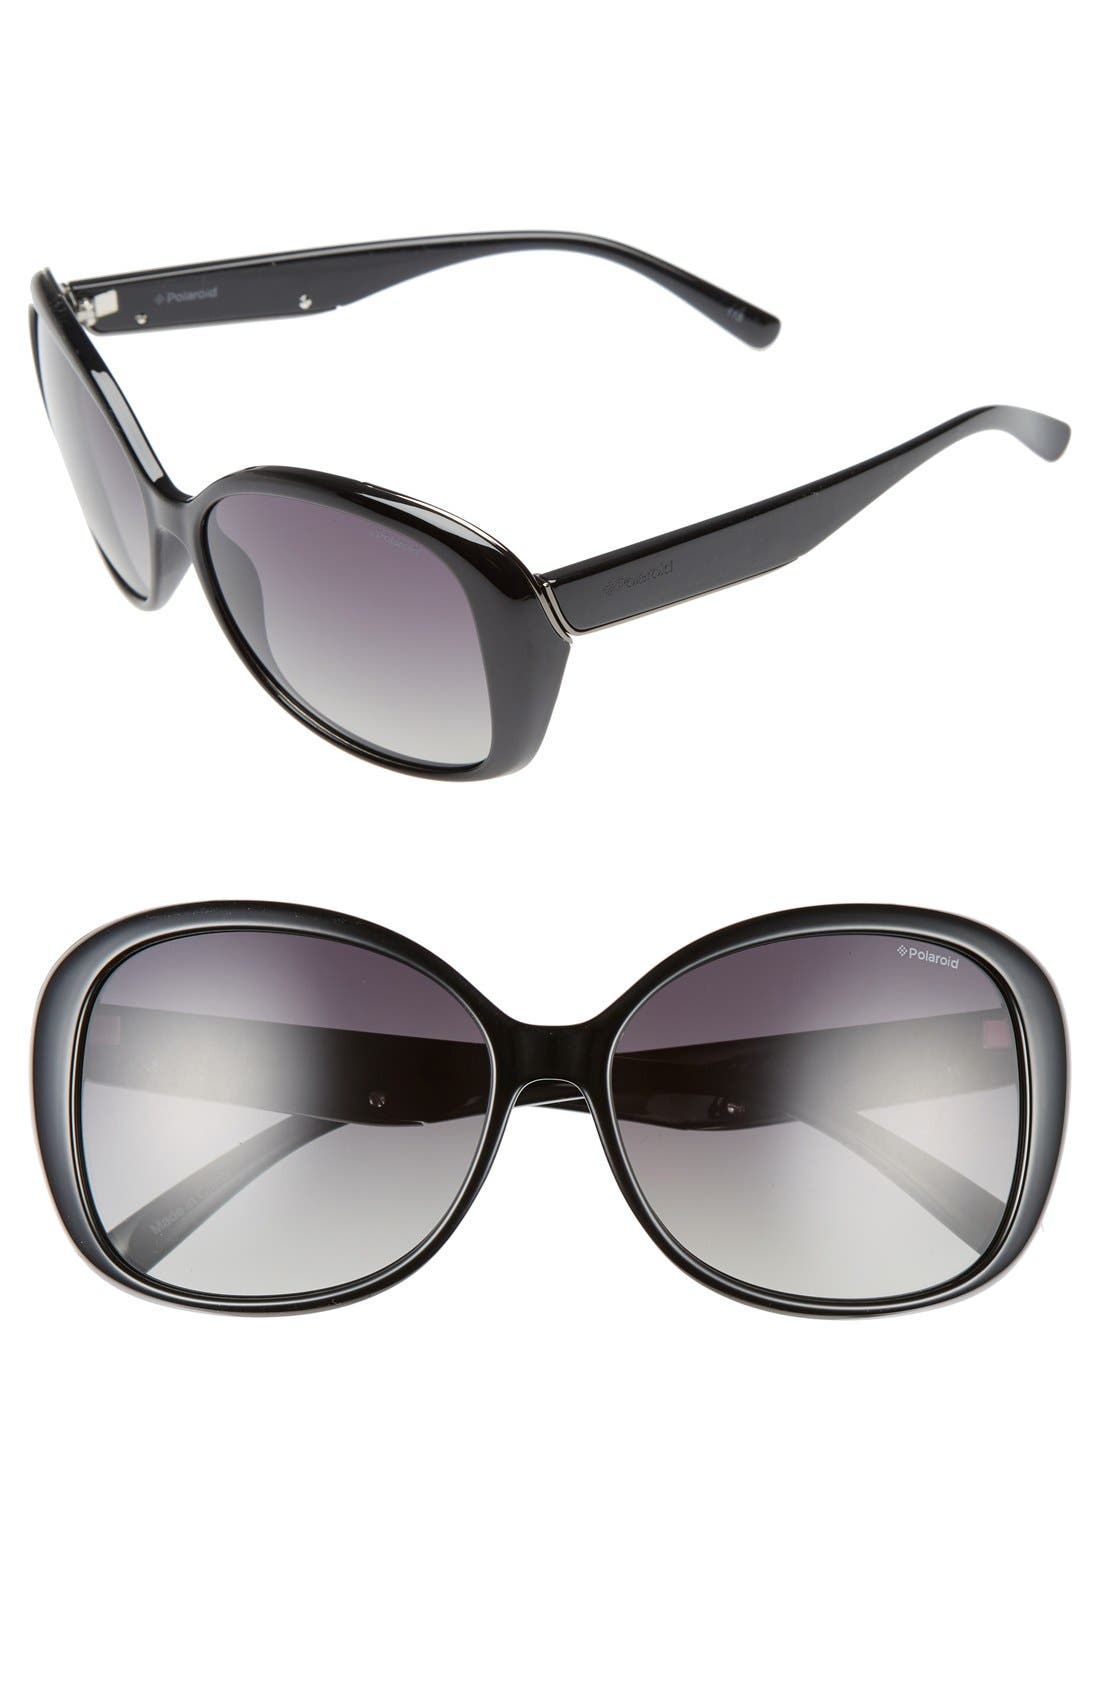 Main Image - Polaroid 59mm Polarized Sunglasses